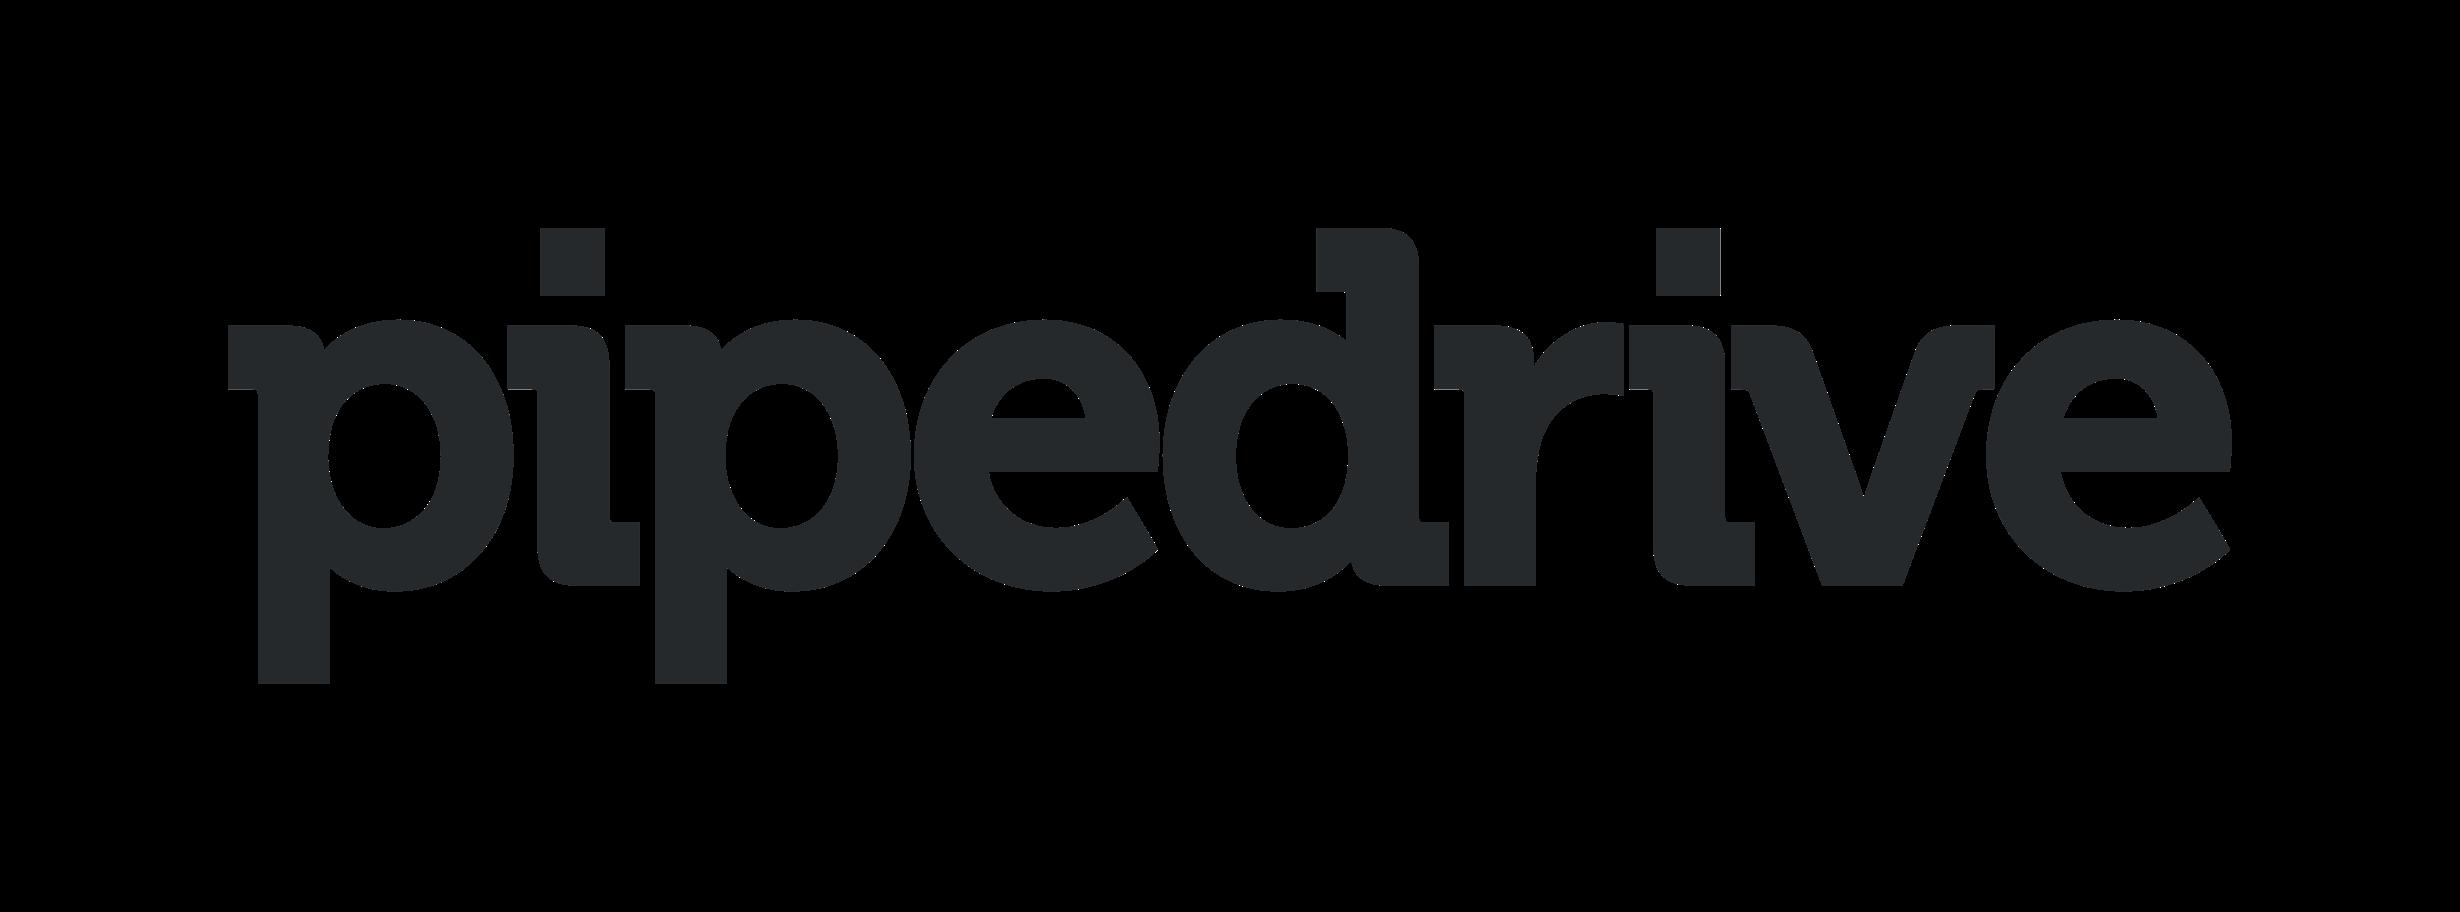 Online-Vertriebsberatung - Pipedrive Partner Logo